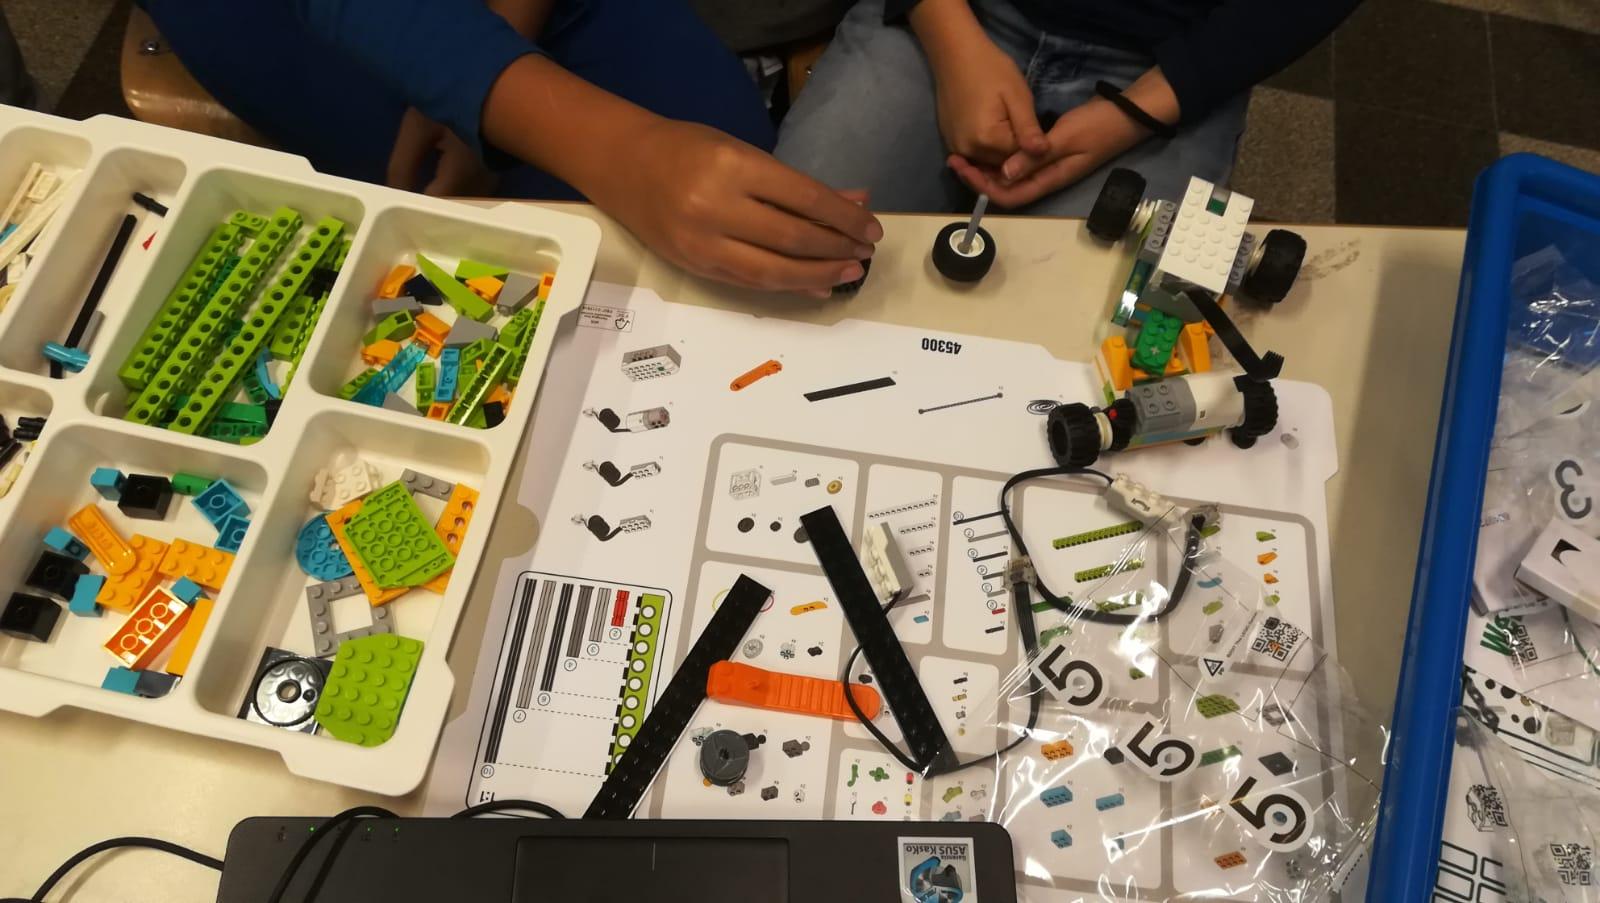 pon-fablab-palermo-scuola-coding-robotica-stampa3d-scratch-lego-wedo